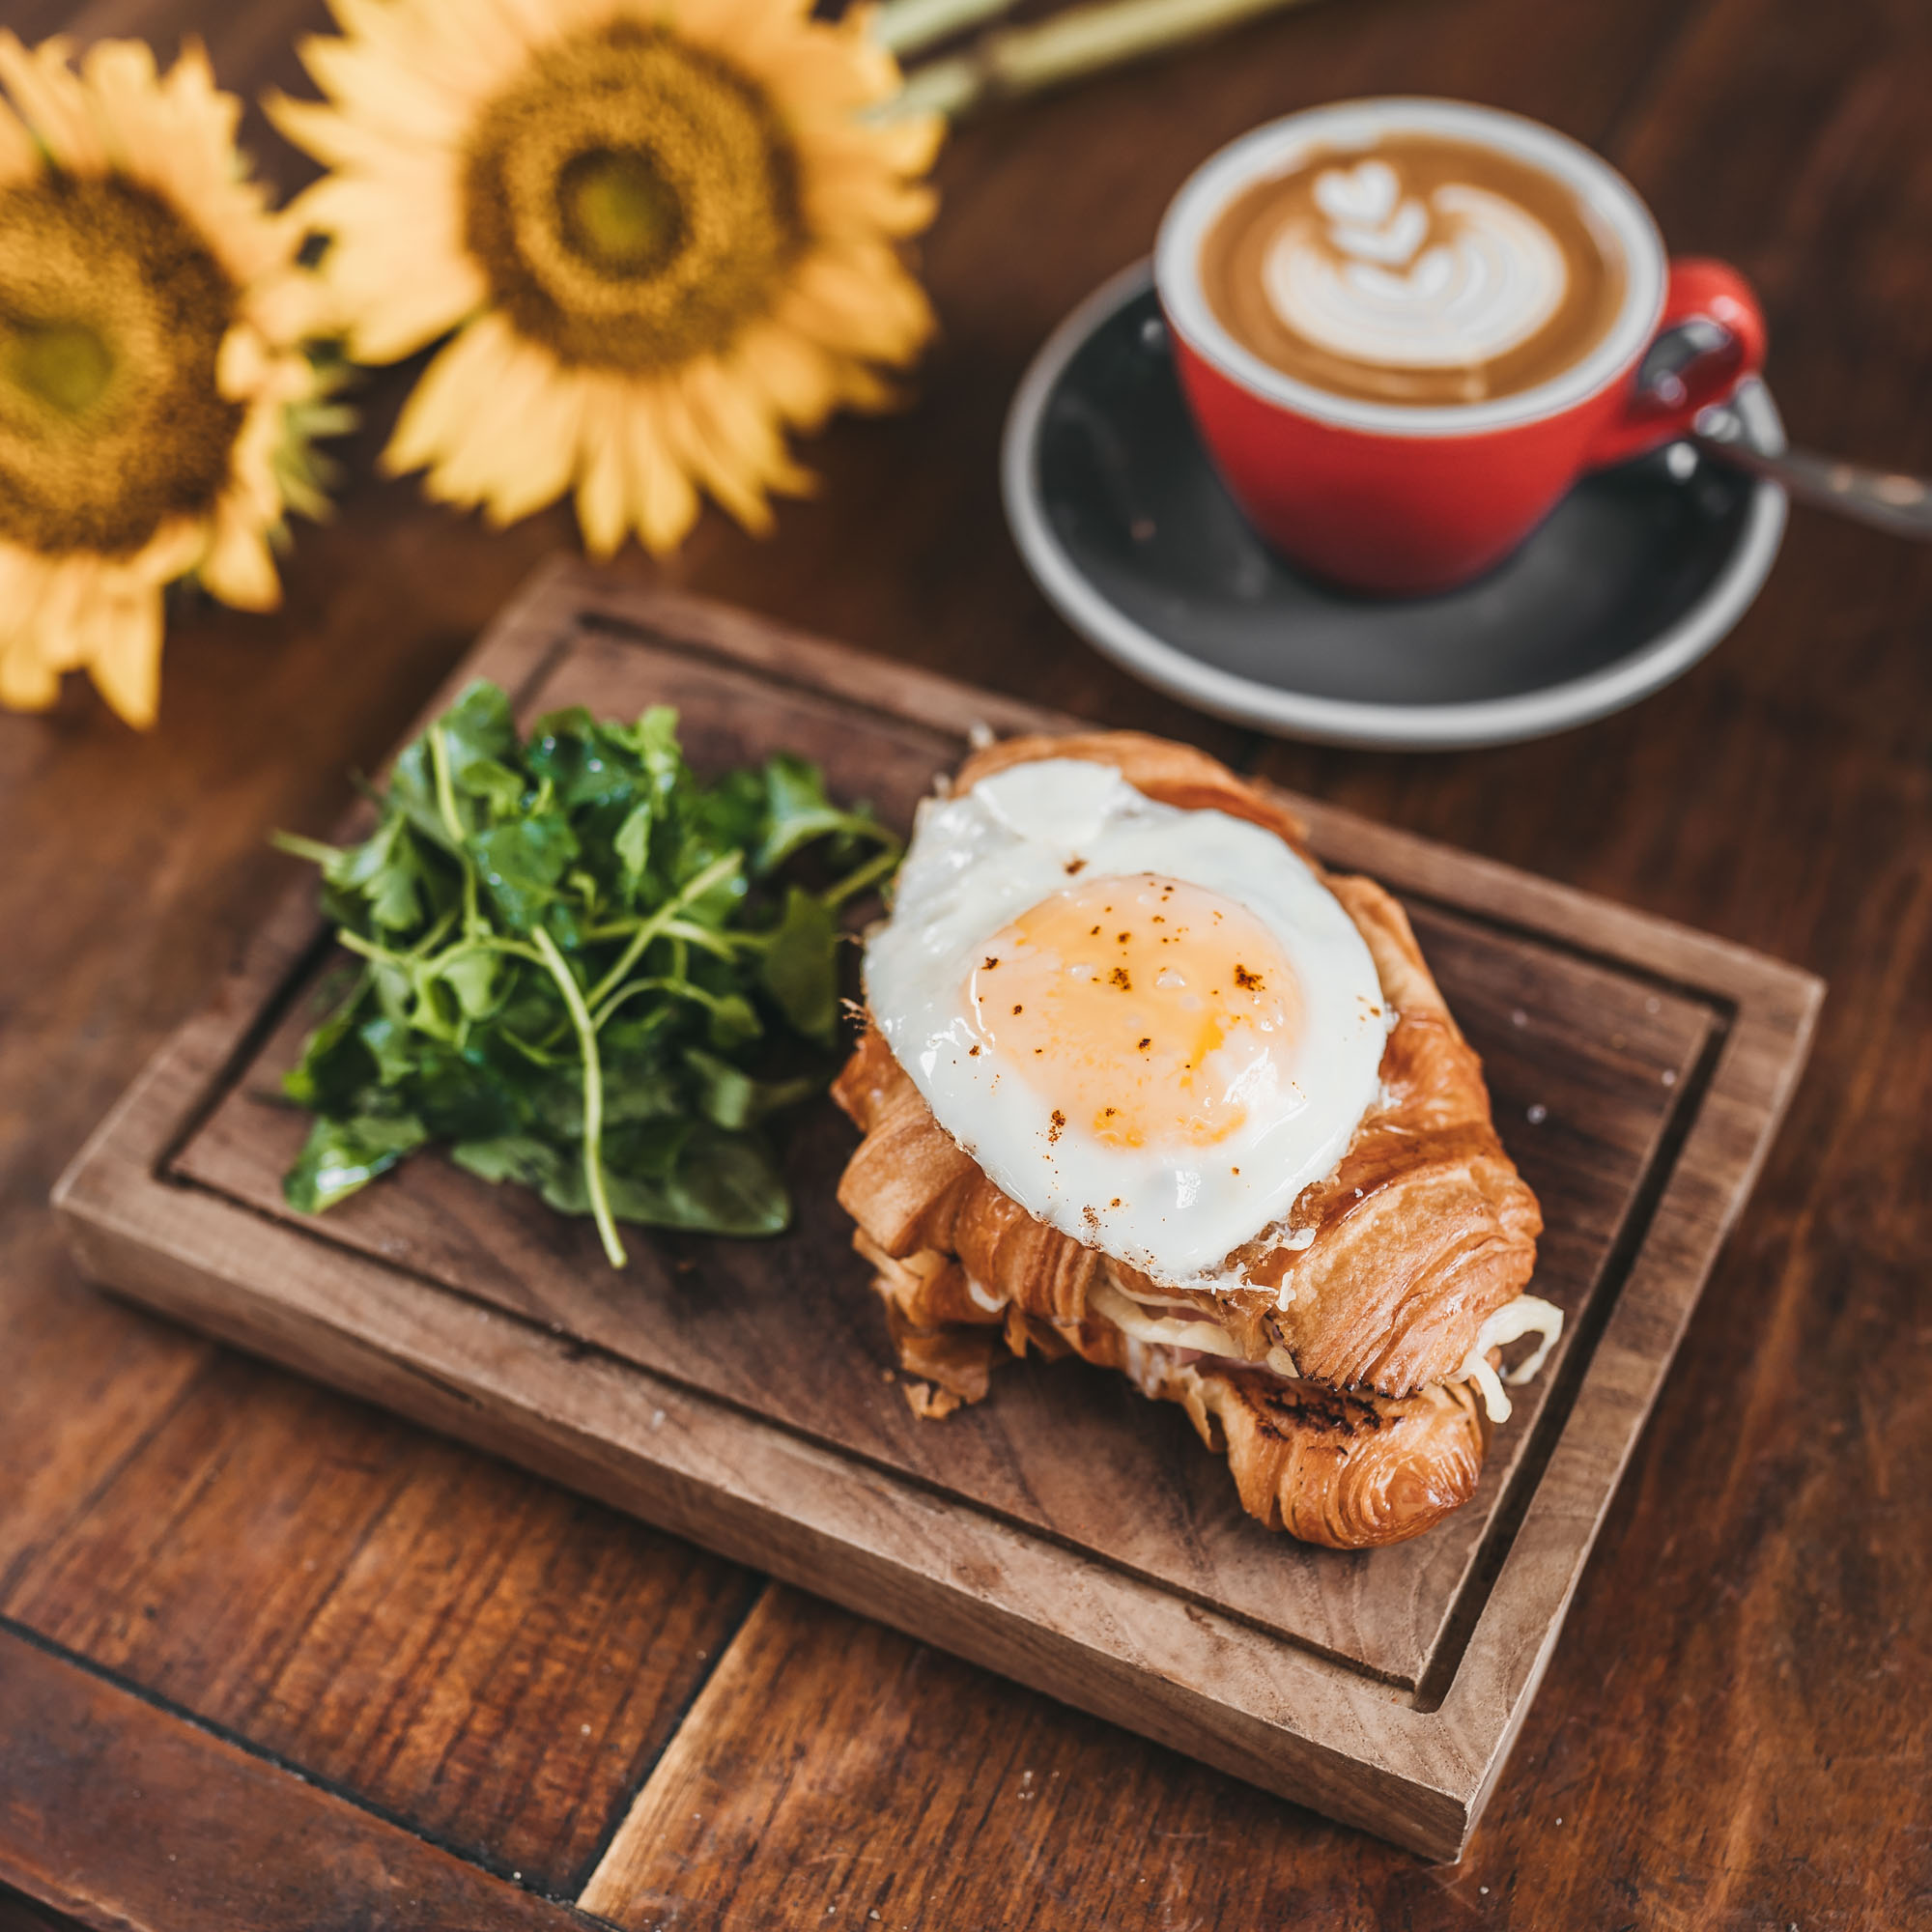 keira-mason-watercress-croissant.jpg